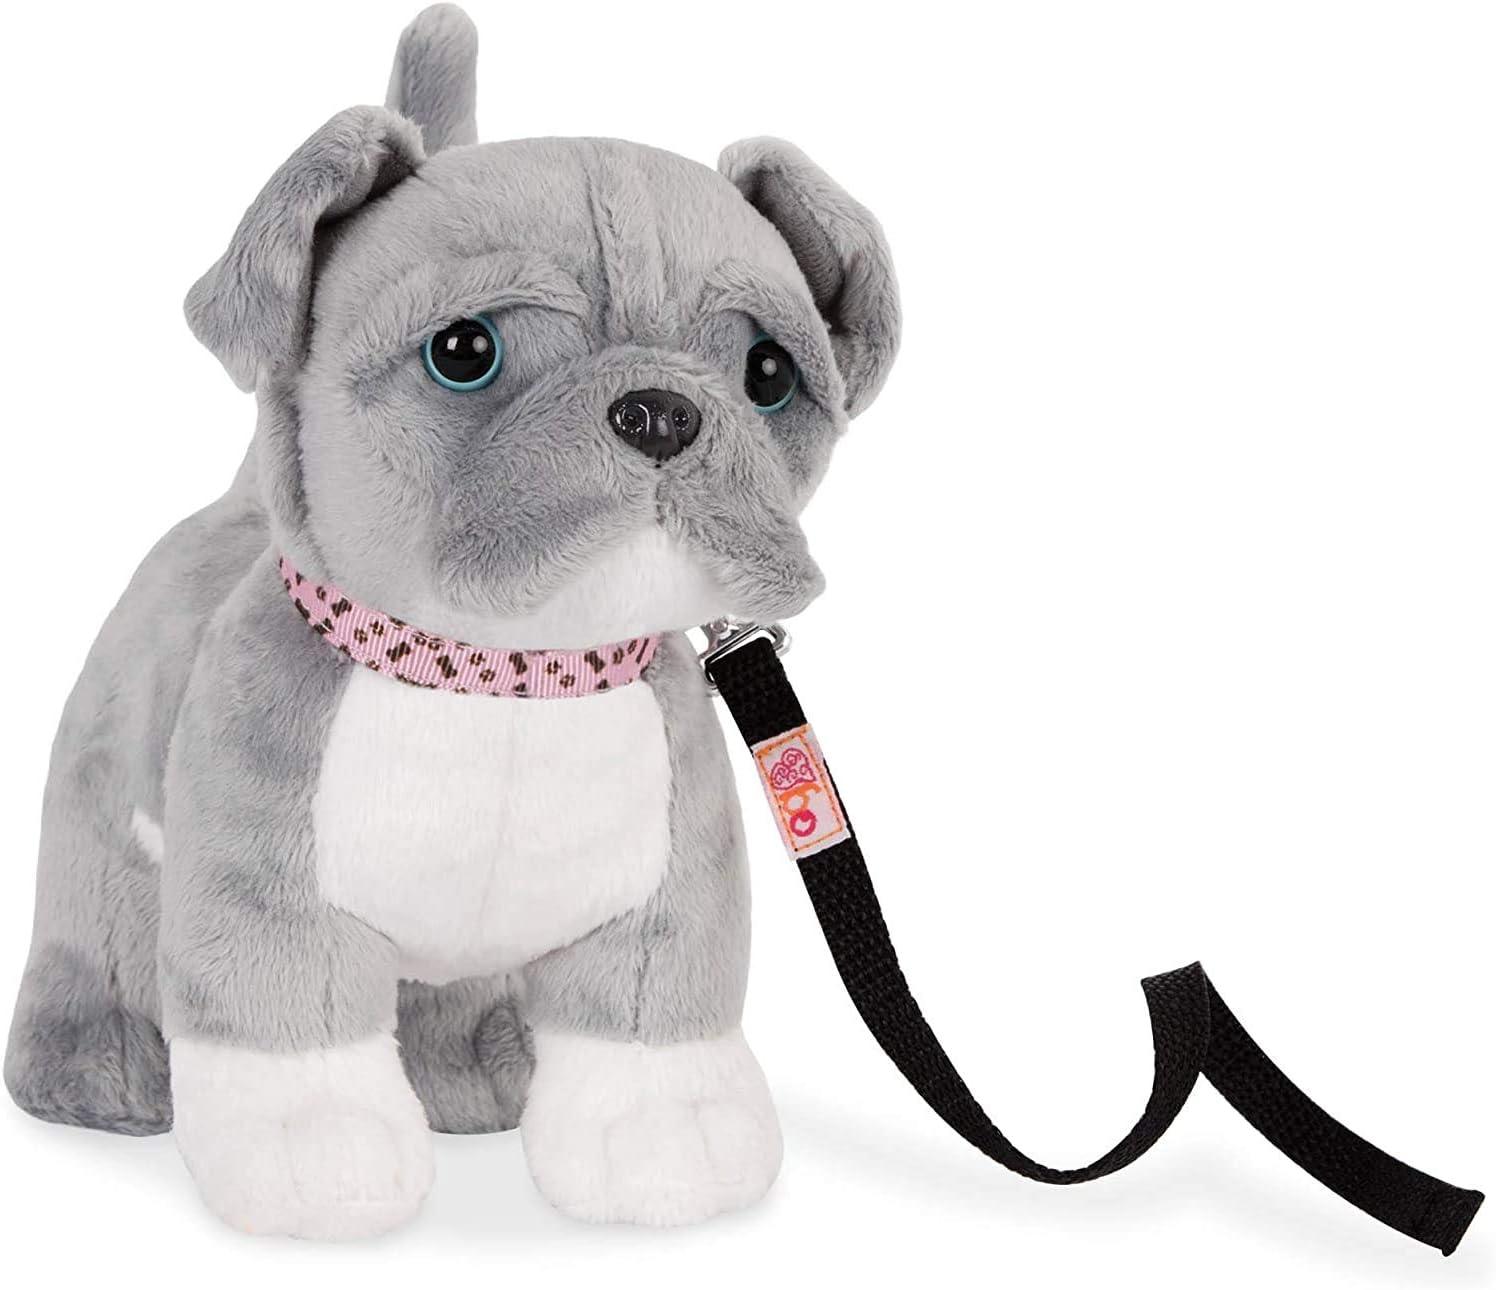 Our Generation Pitbull Dog, bd37801z